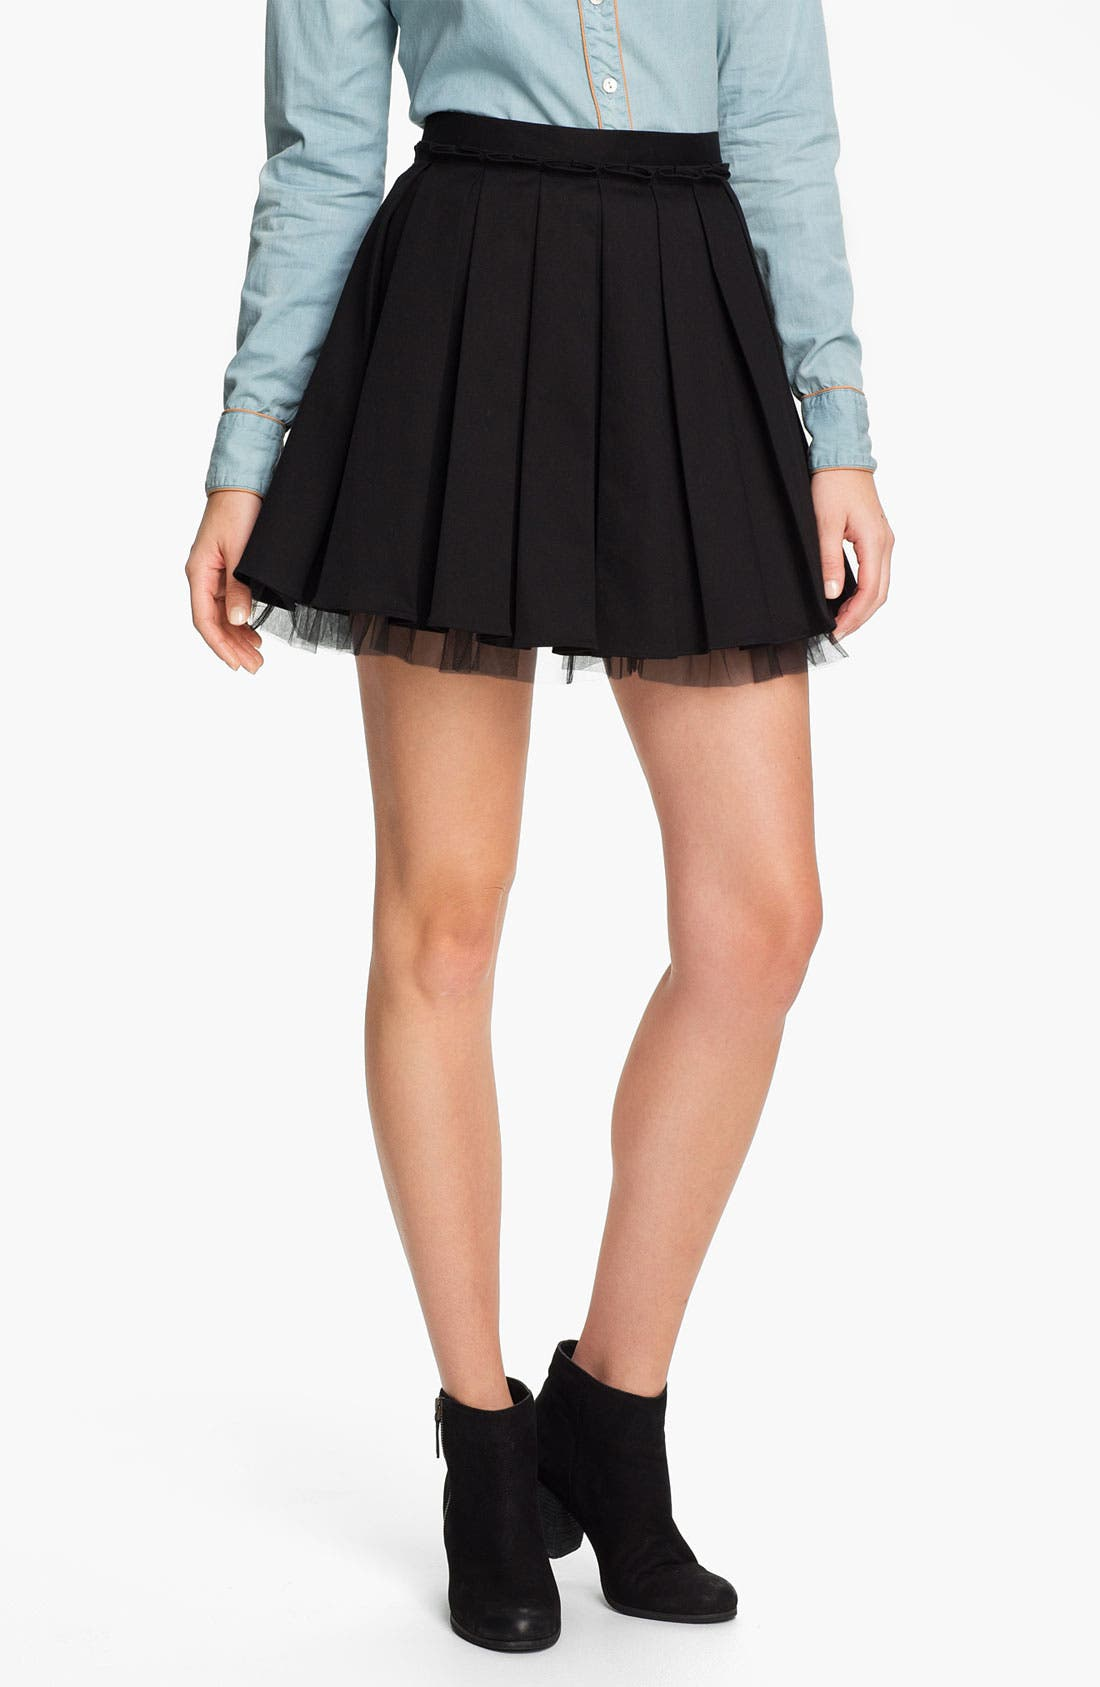 Alternate Image 1 Selected - Collective Concepts 'Rah Rah' Skirt